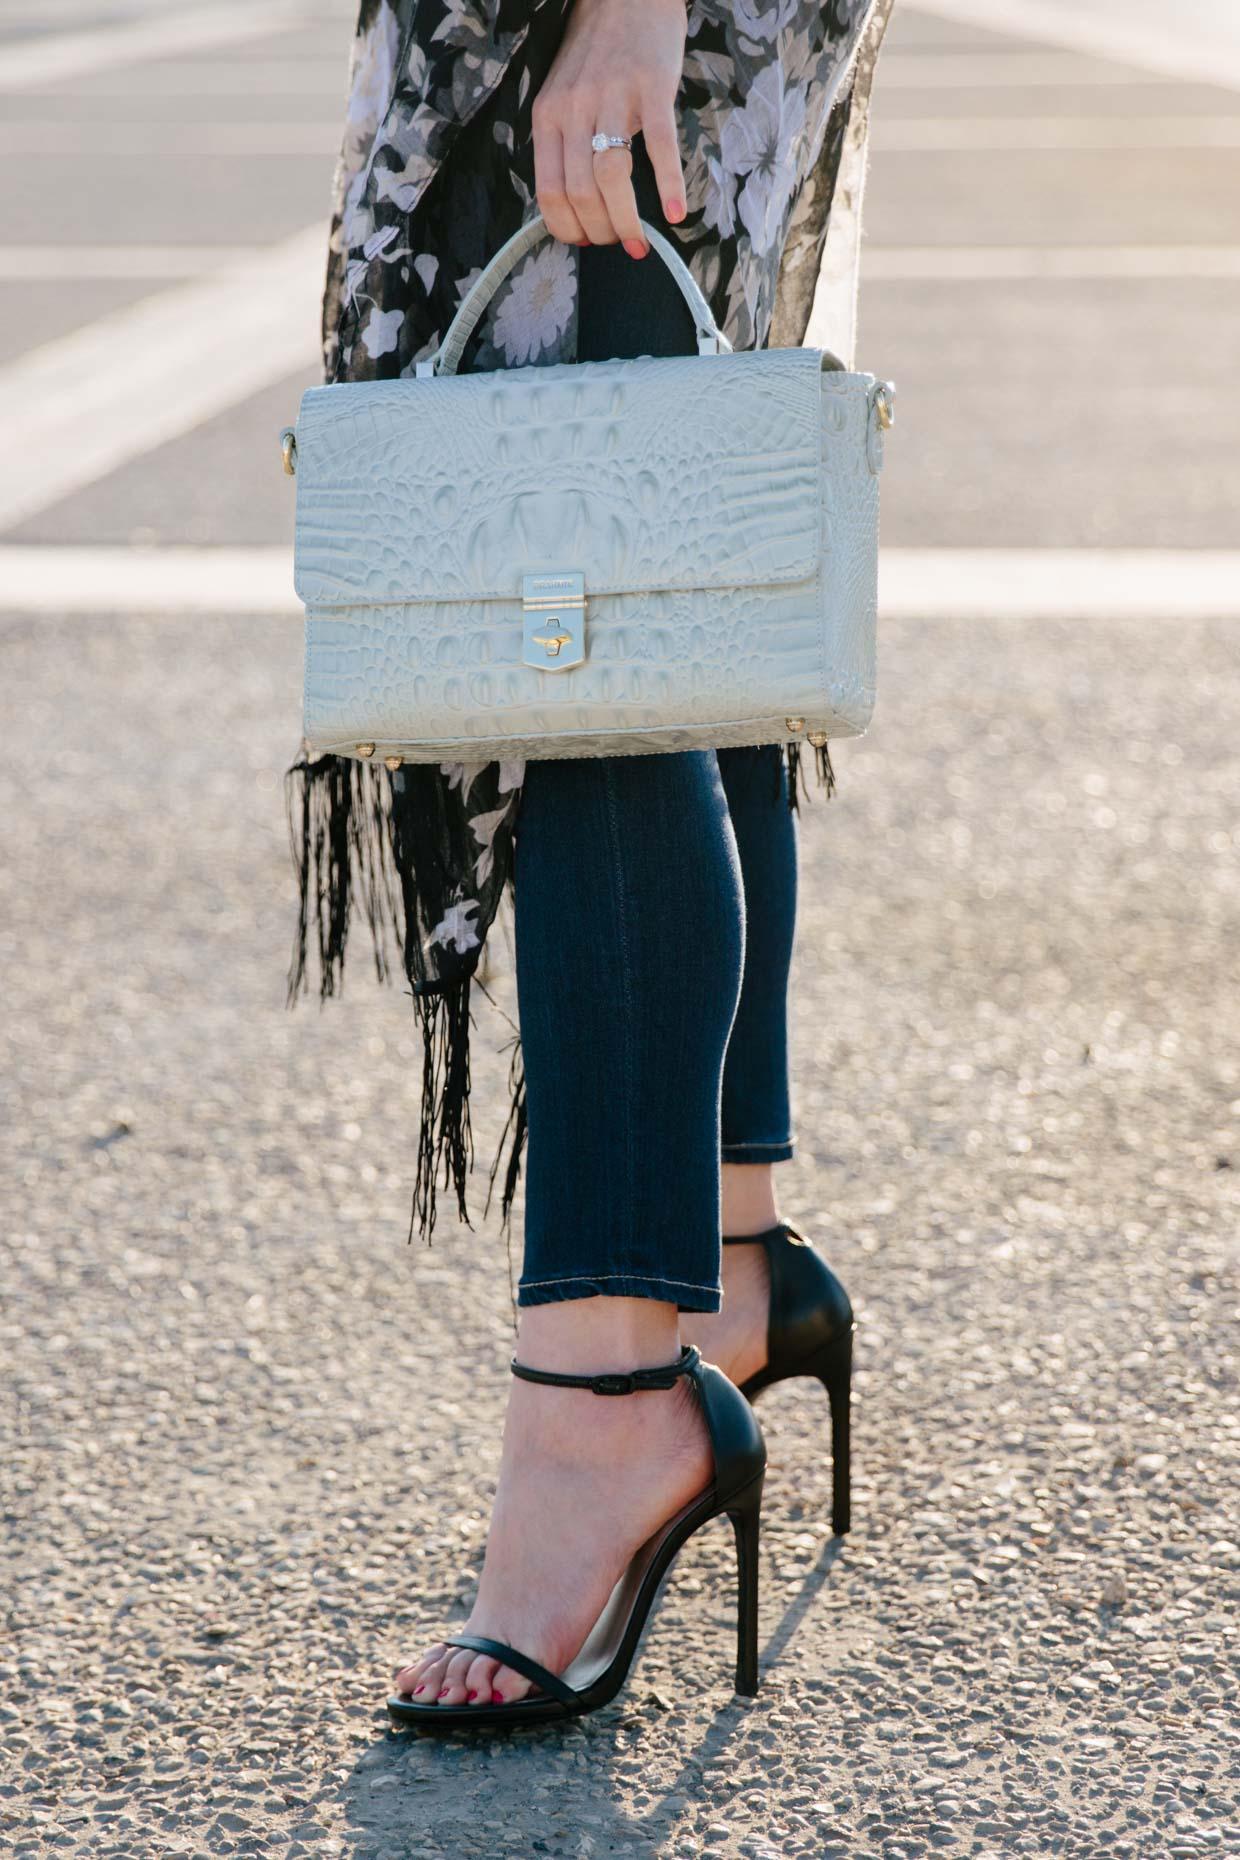 Brahmin Danielle satchel seaglass Melbourne, Stuart Weitzman